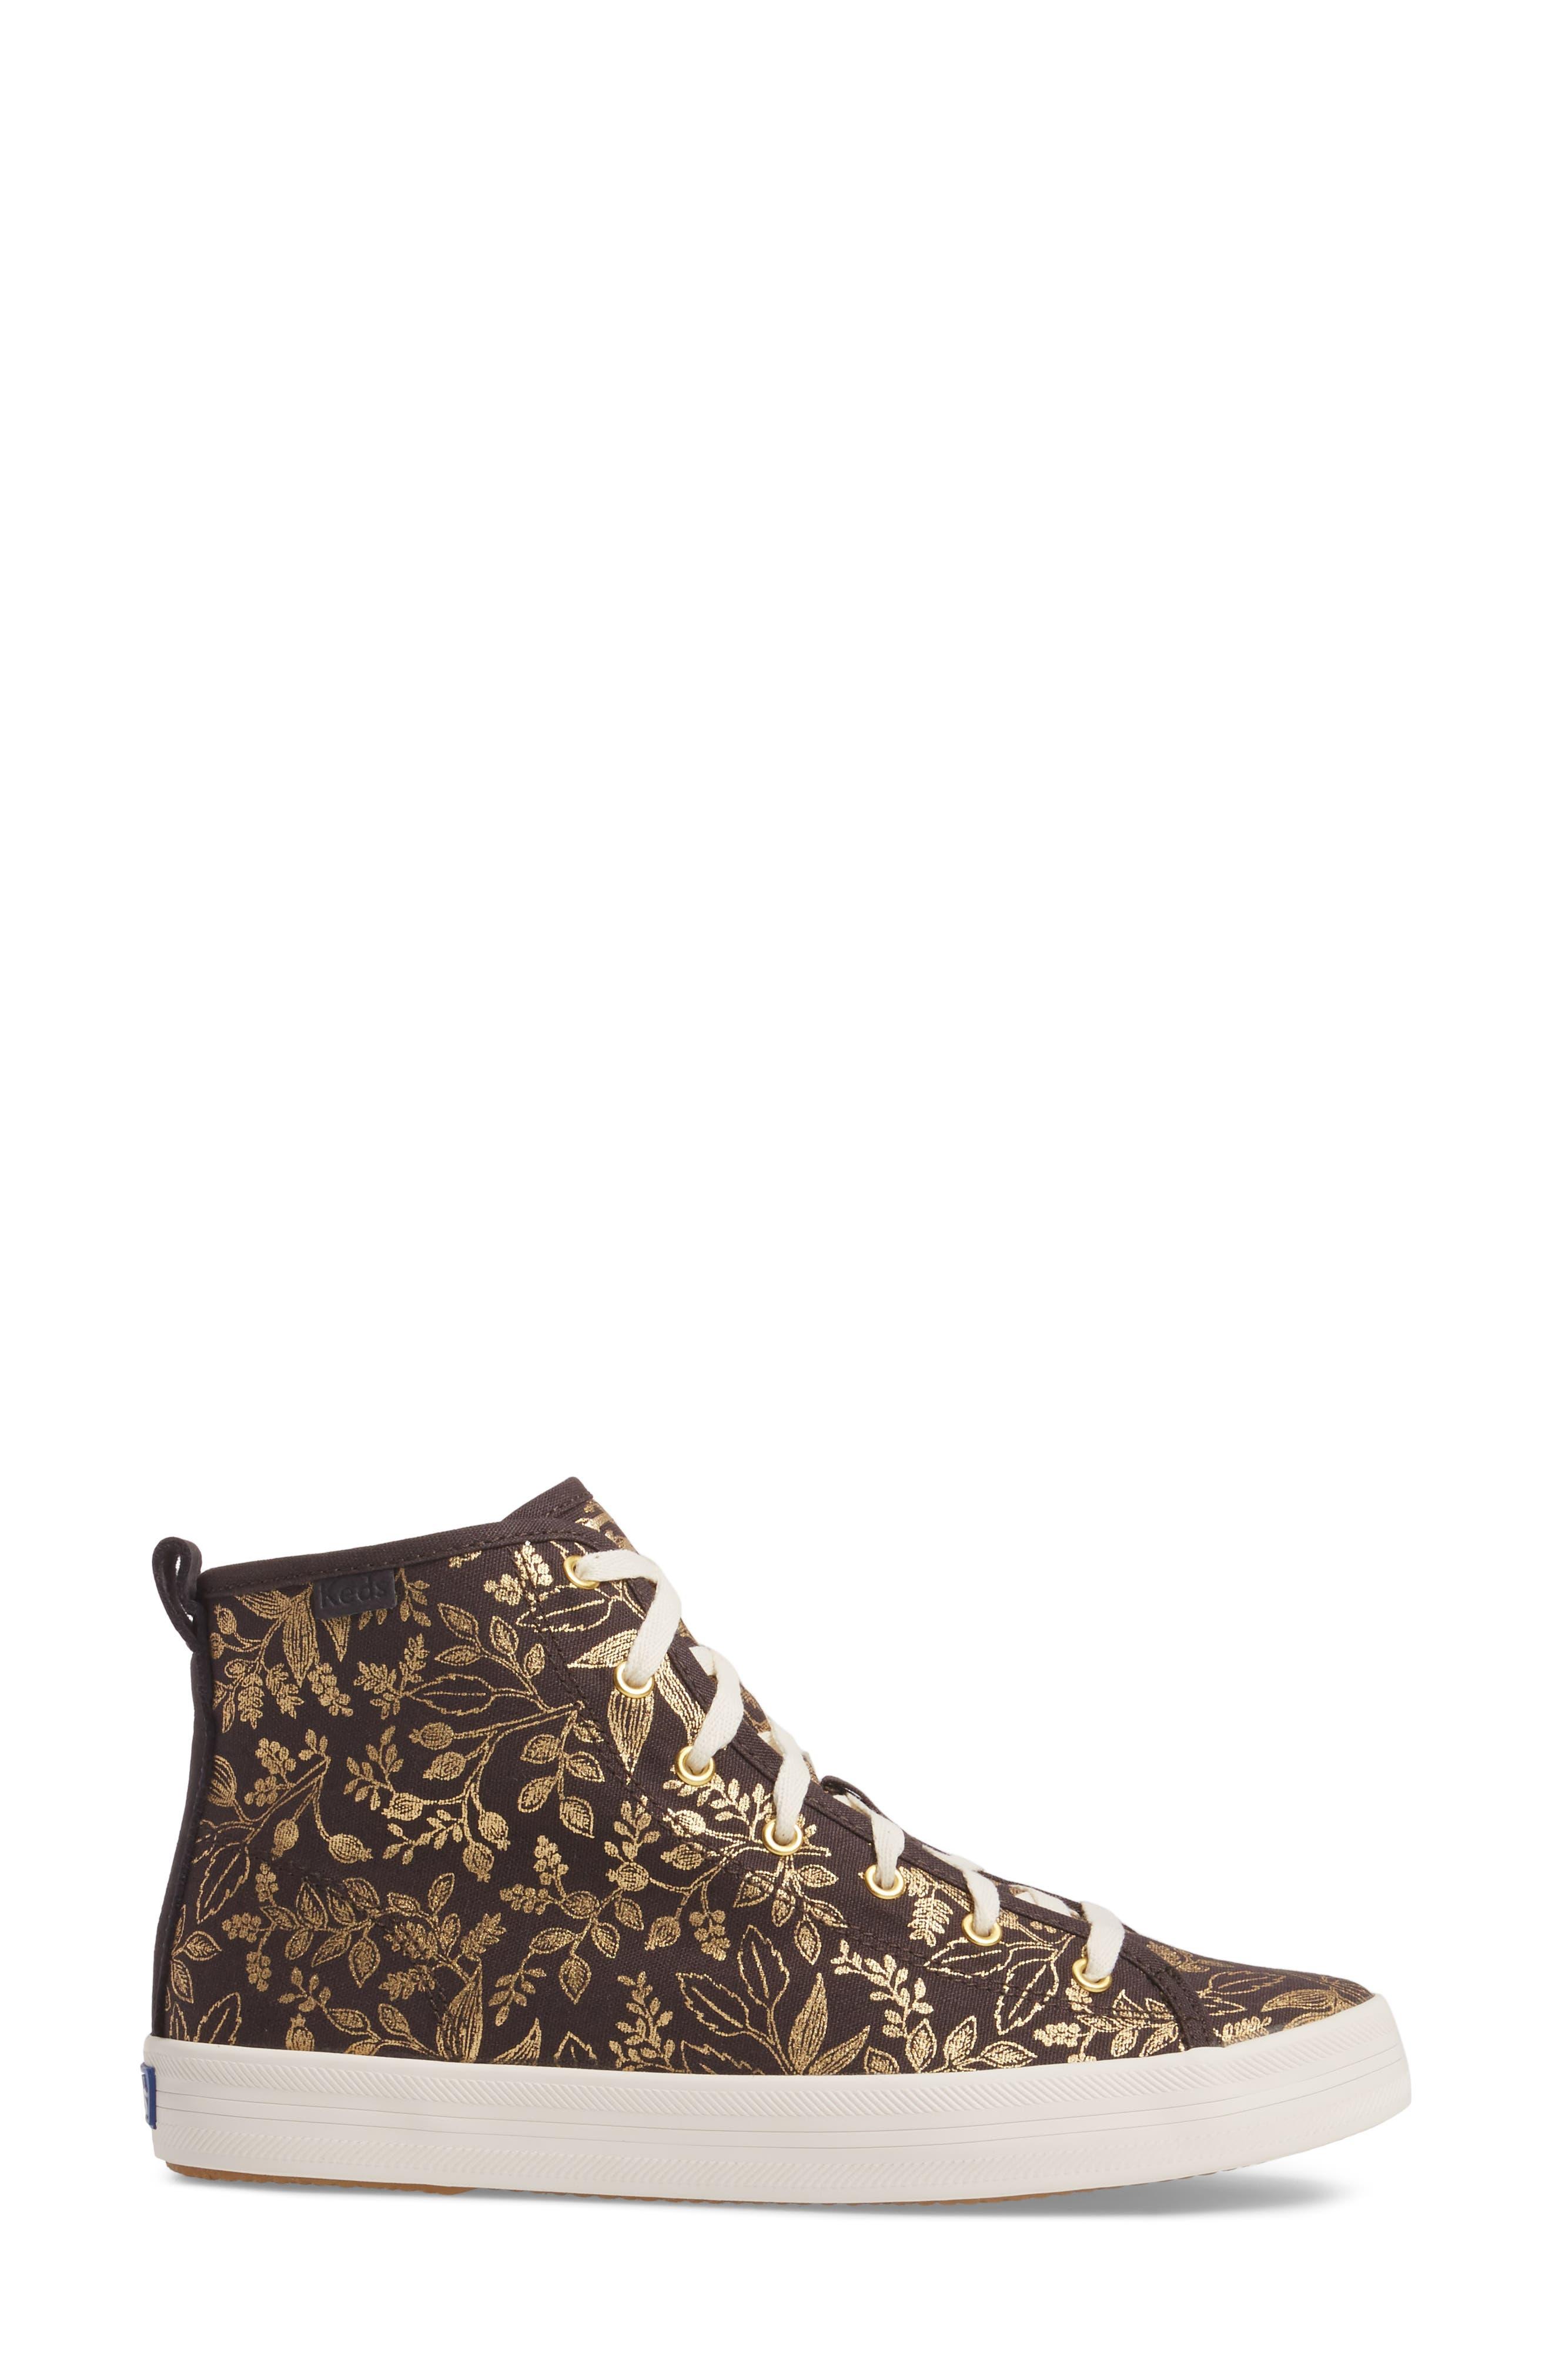 Alternate Image 3  - Keds® x Rifle Paper Co. Queen Anne High Top Sneaker (Women)